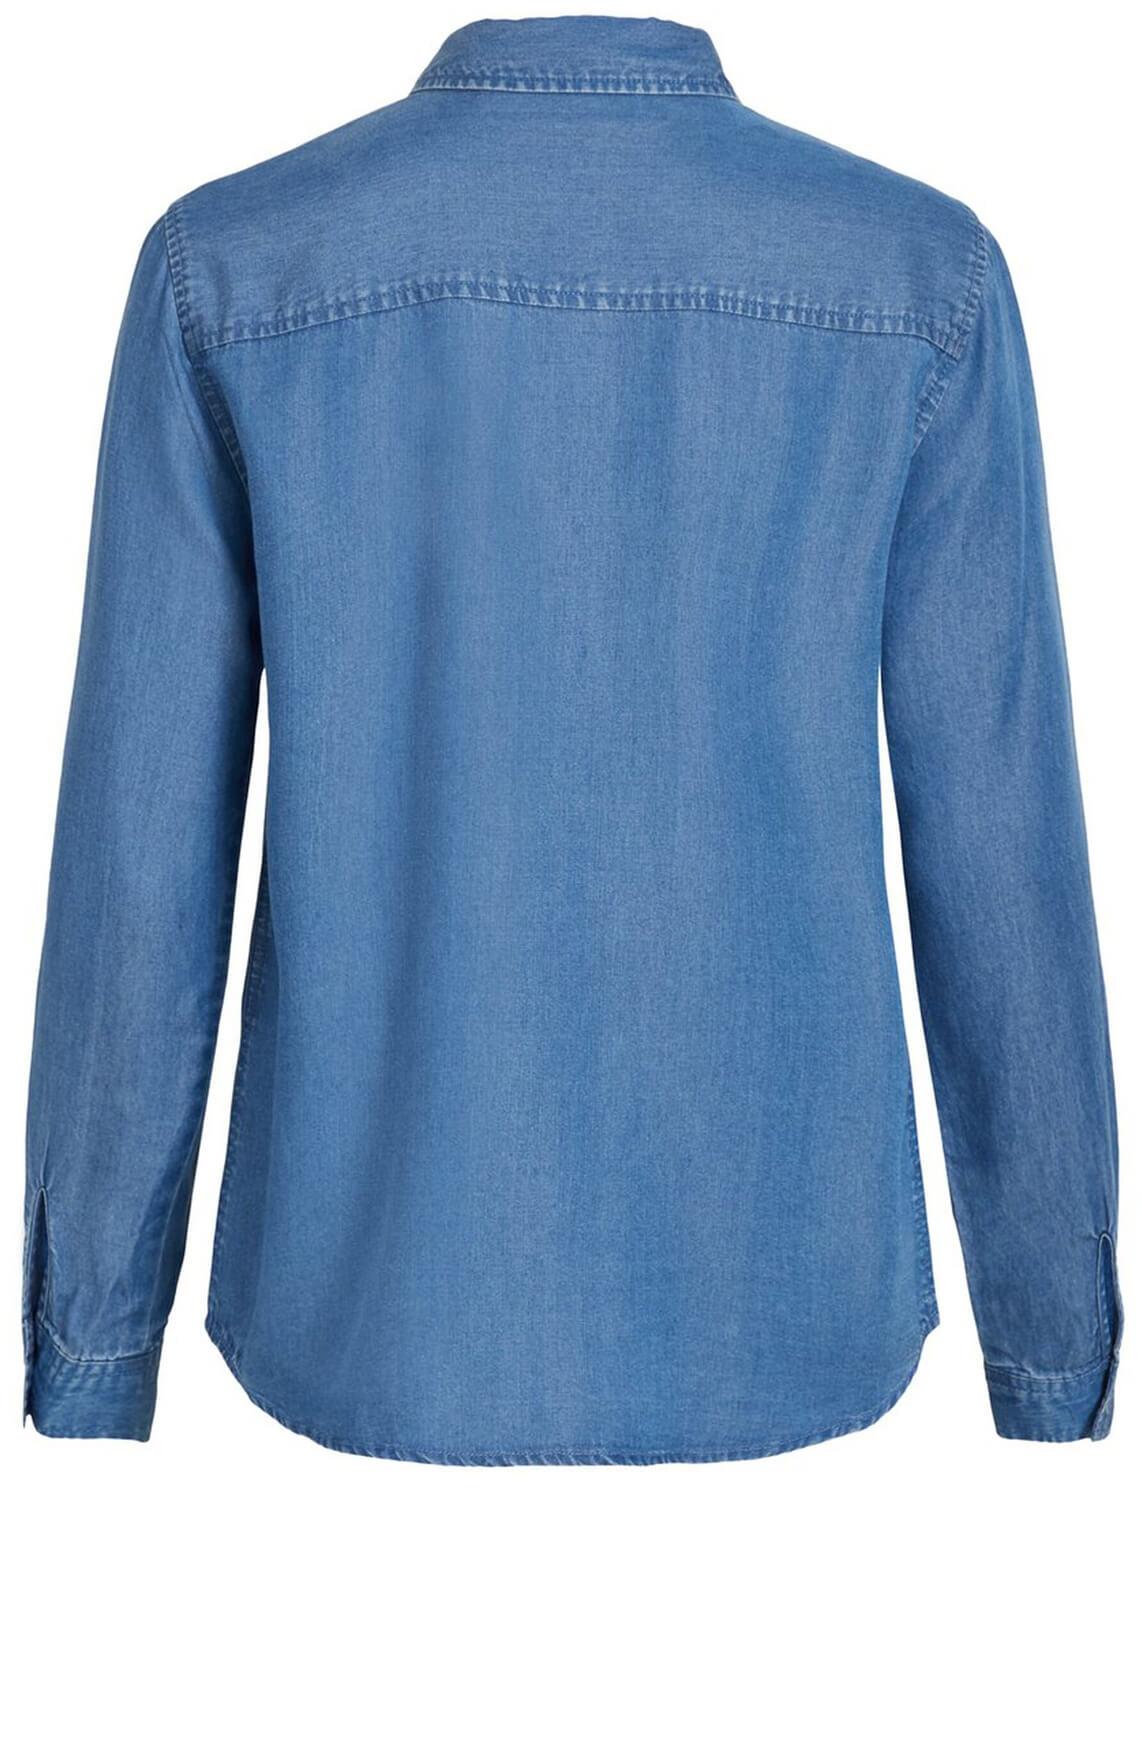 Object Dames Spijkerblouse Blauw